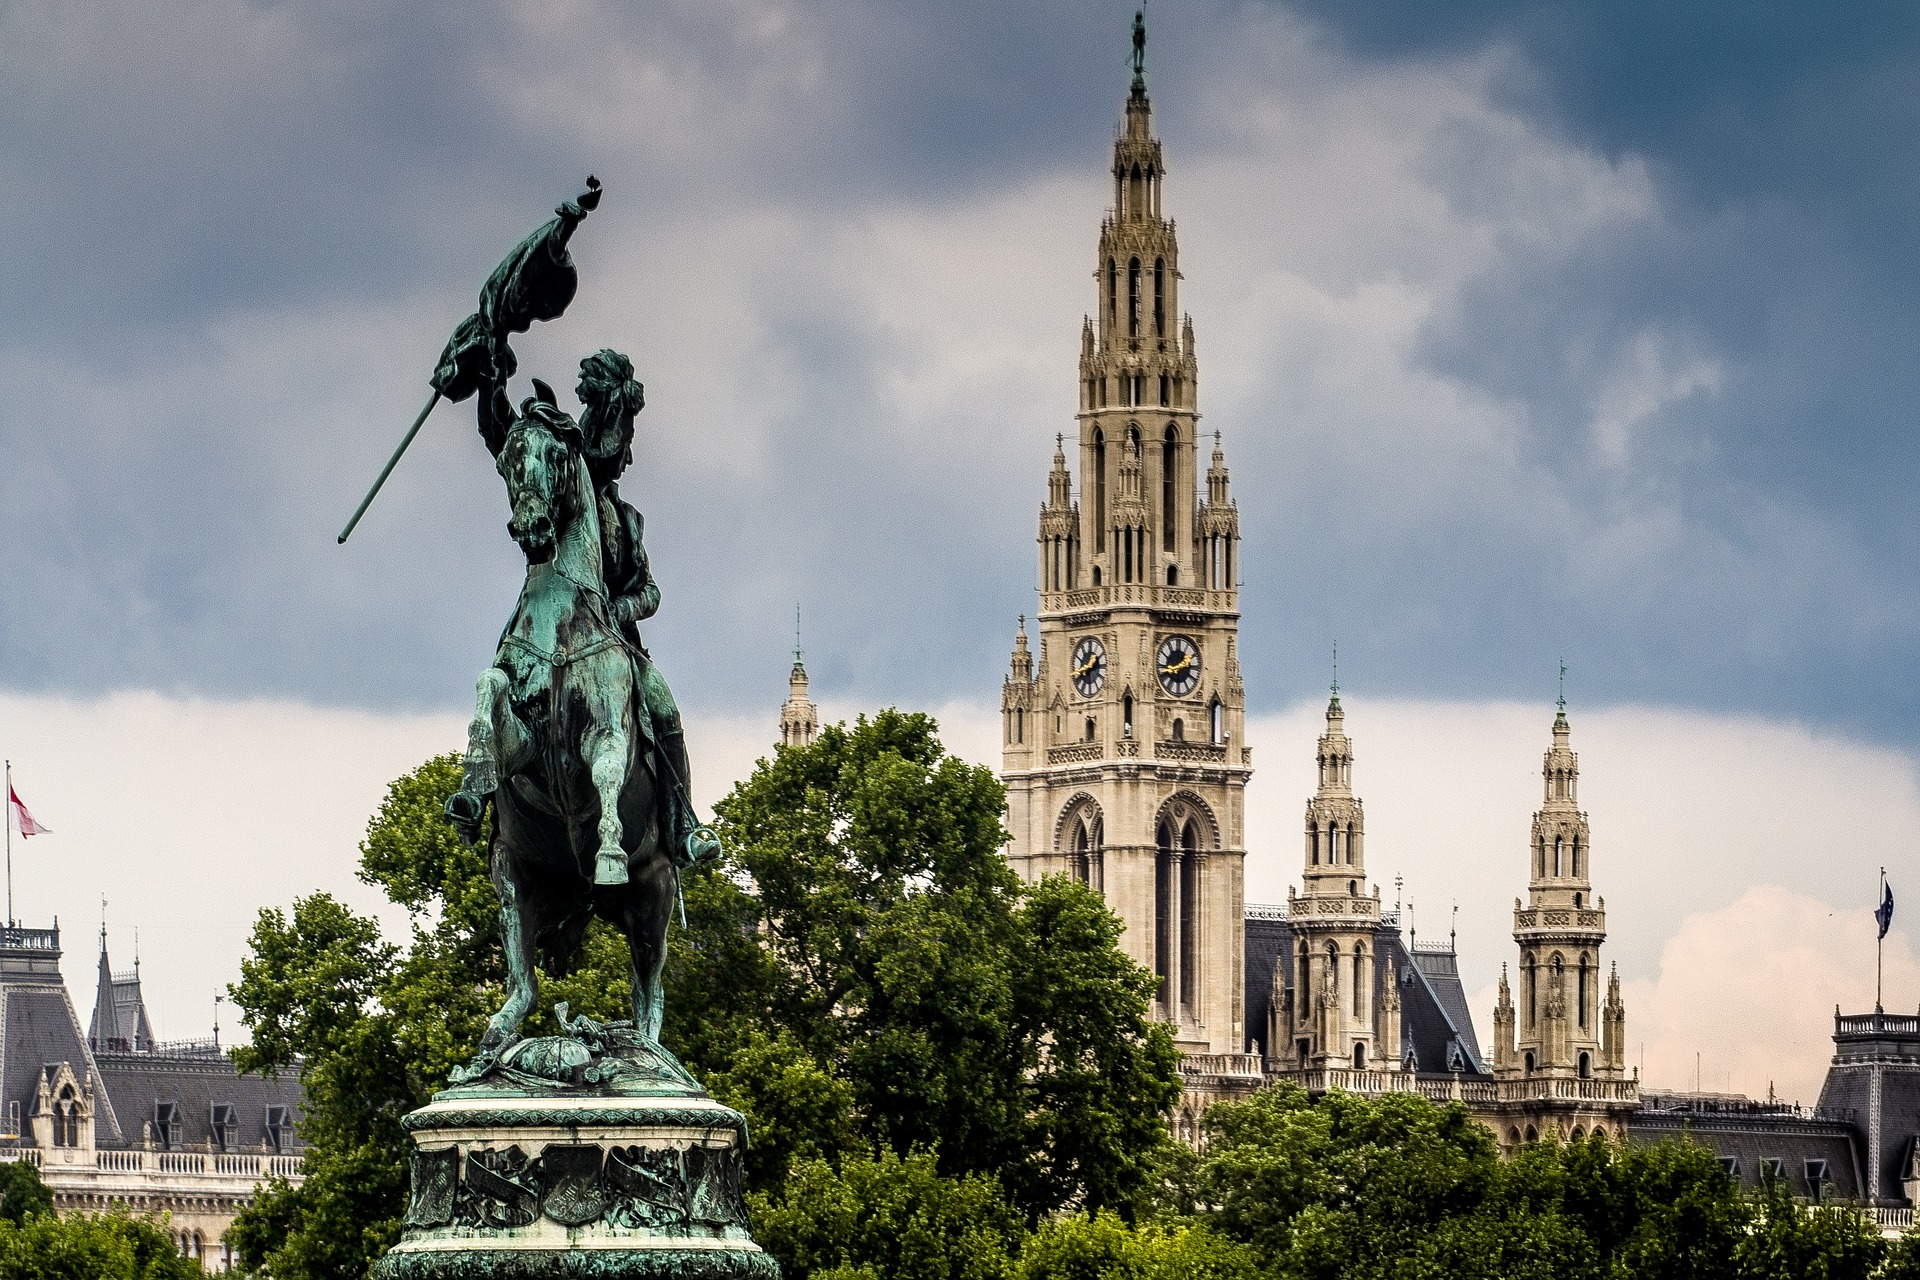 Das Wiener Rathaus, Foto: CC0 Public Domain, domeckopol/Pixabay